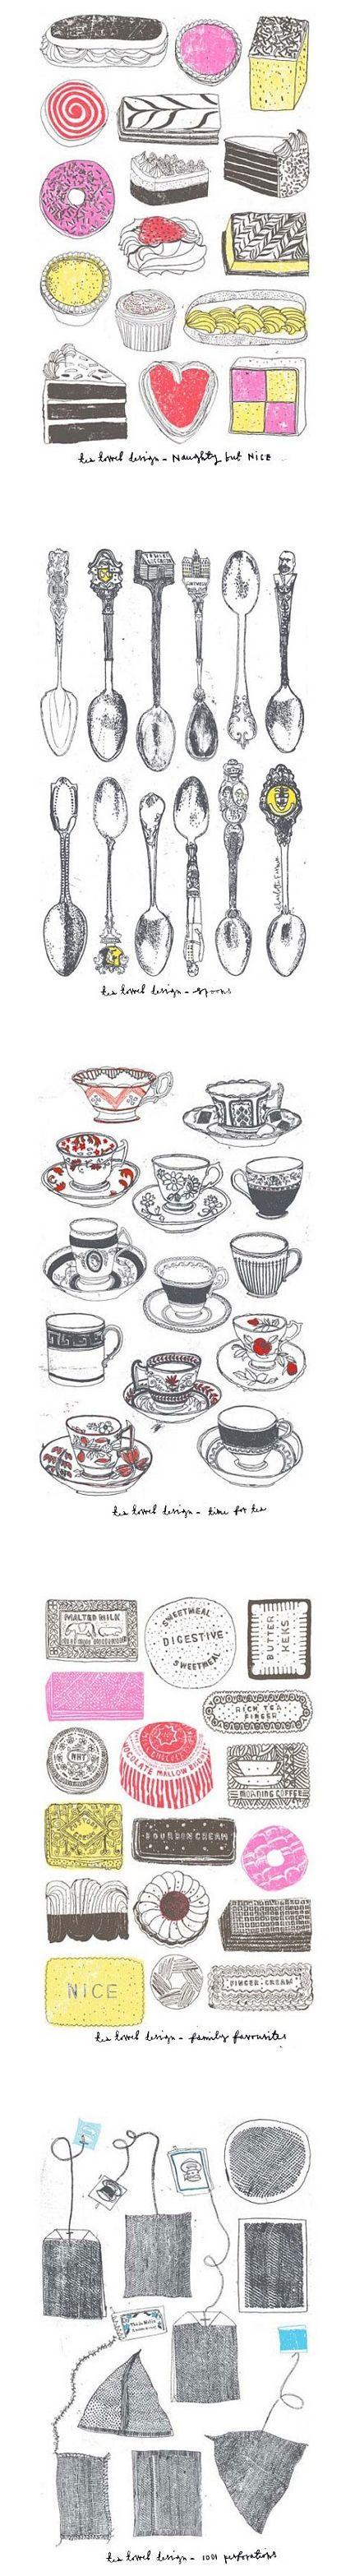 Illustrations by Charlotte Farmer